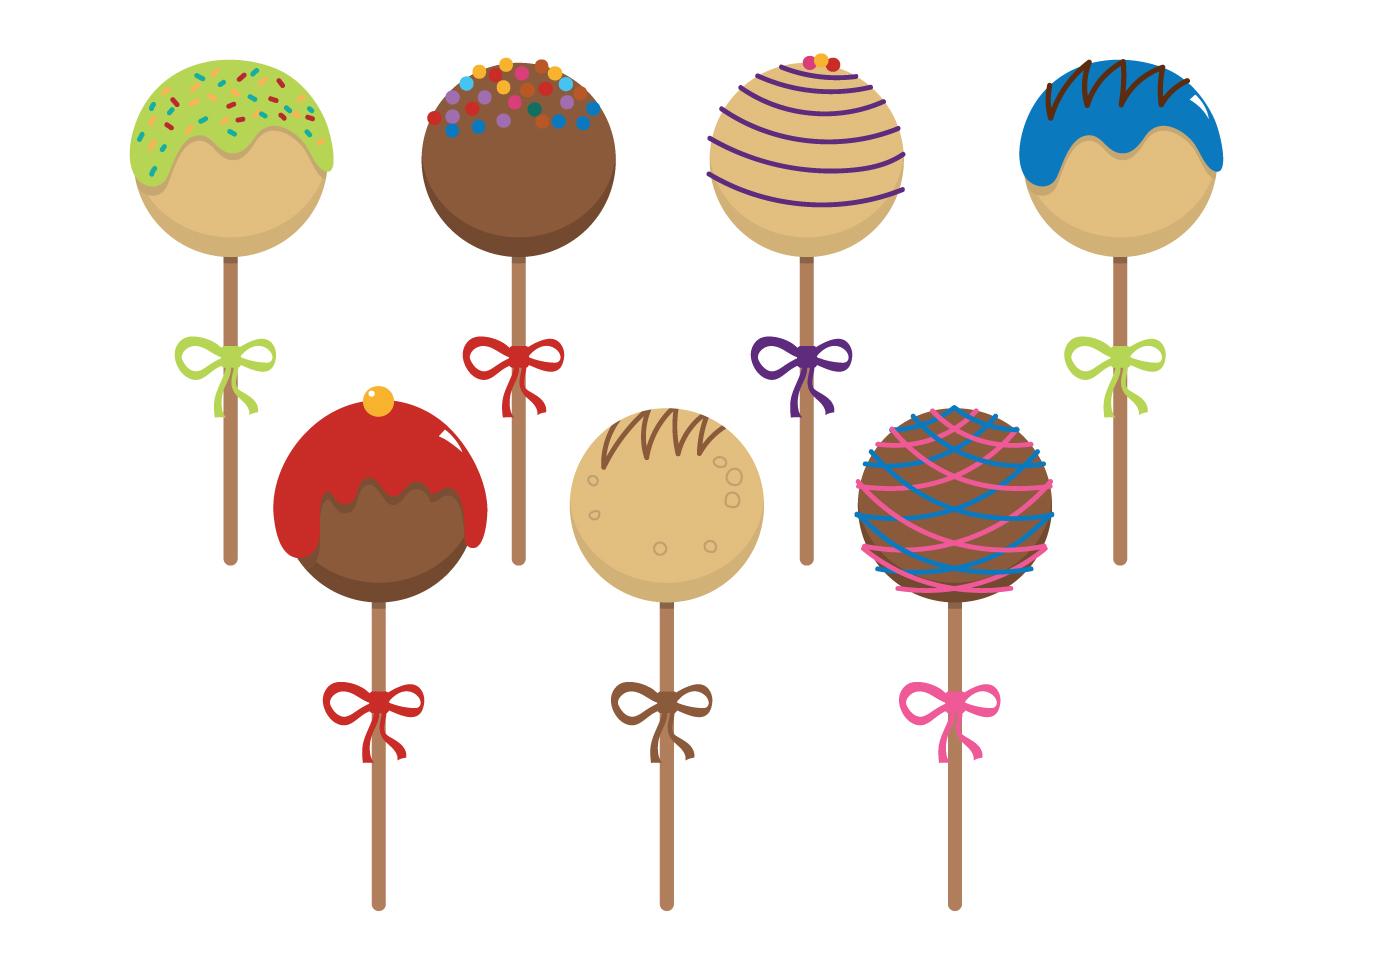 Cake Pop Clipart Free : Cake Pops Vector - Download Free Vector Art, Stock ...